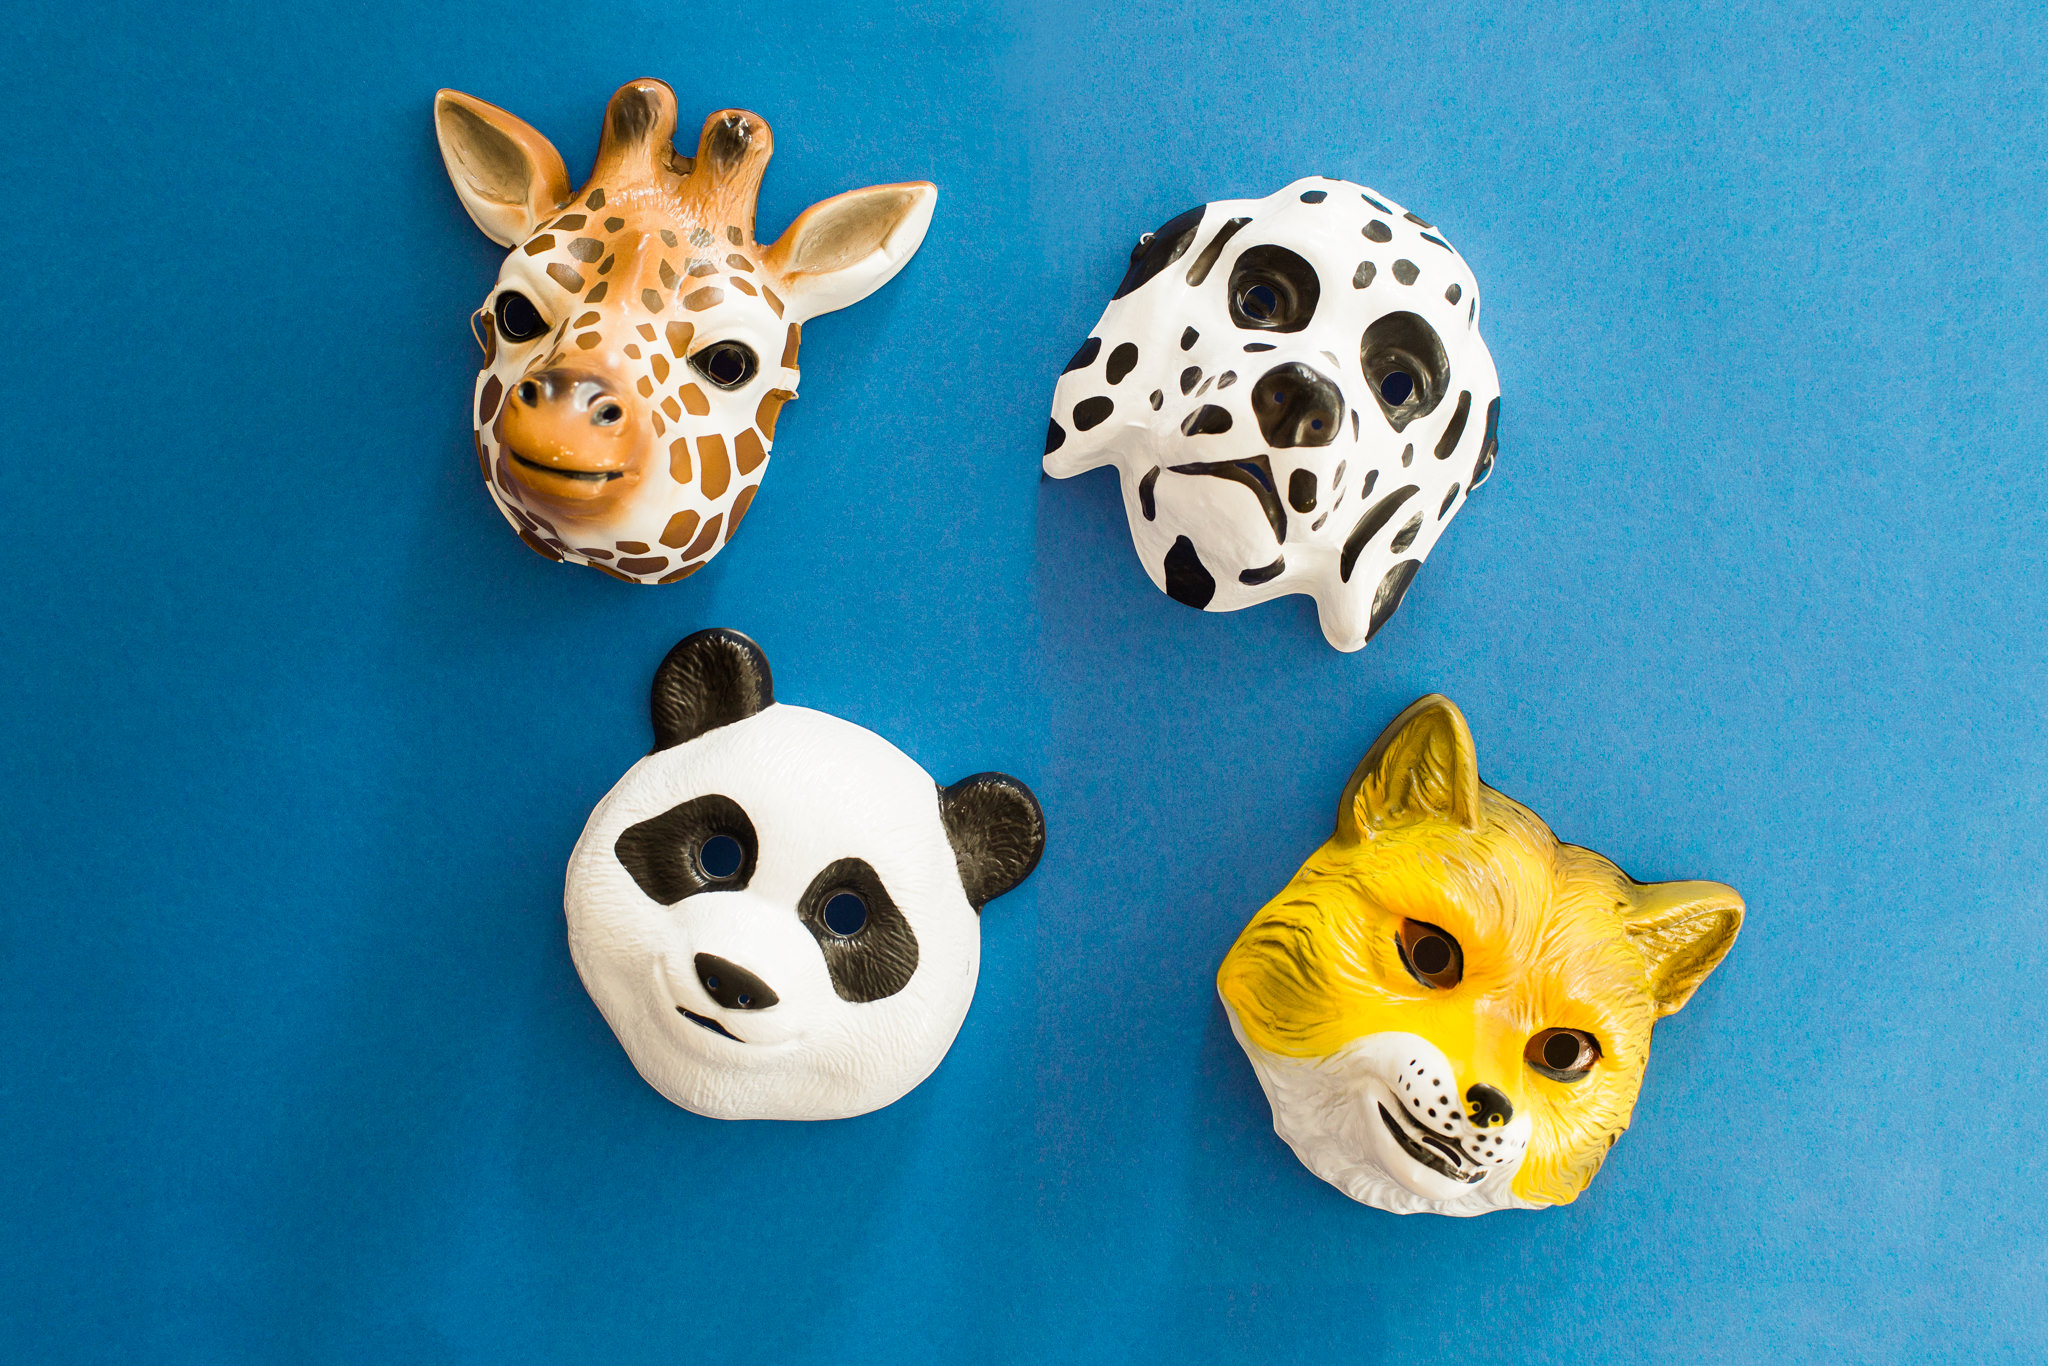 prop-hire-photo-booth-wedding-animal-masks-fox-panda-giraffe-dog-plastic-funny.jpg